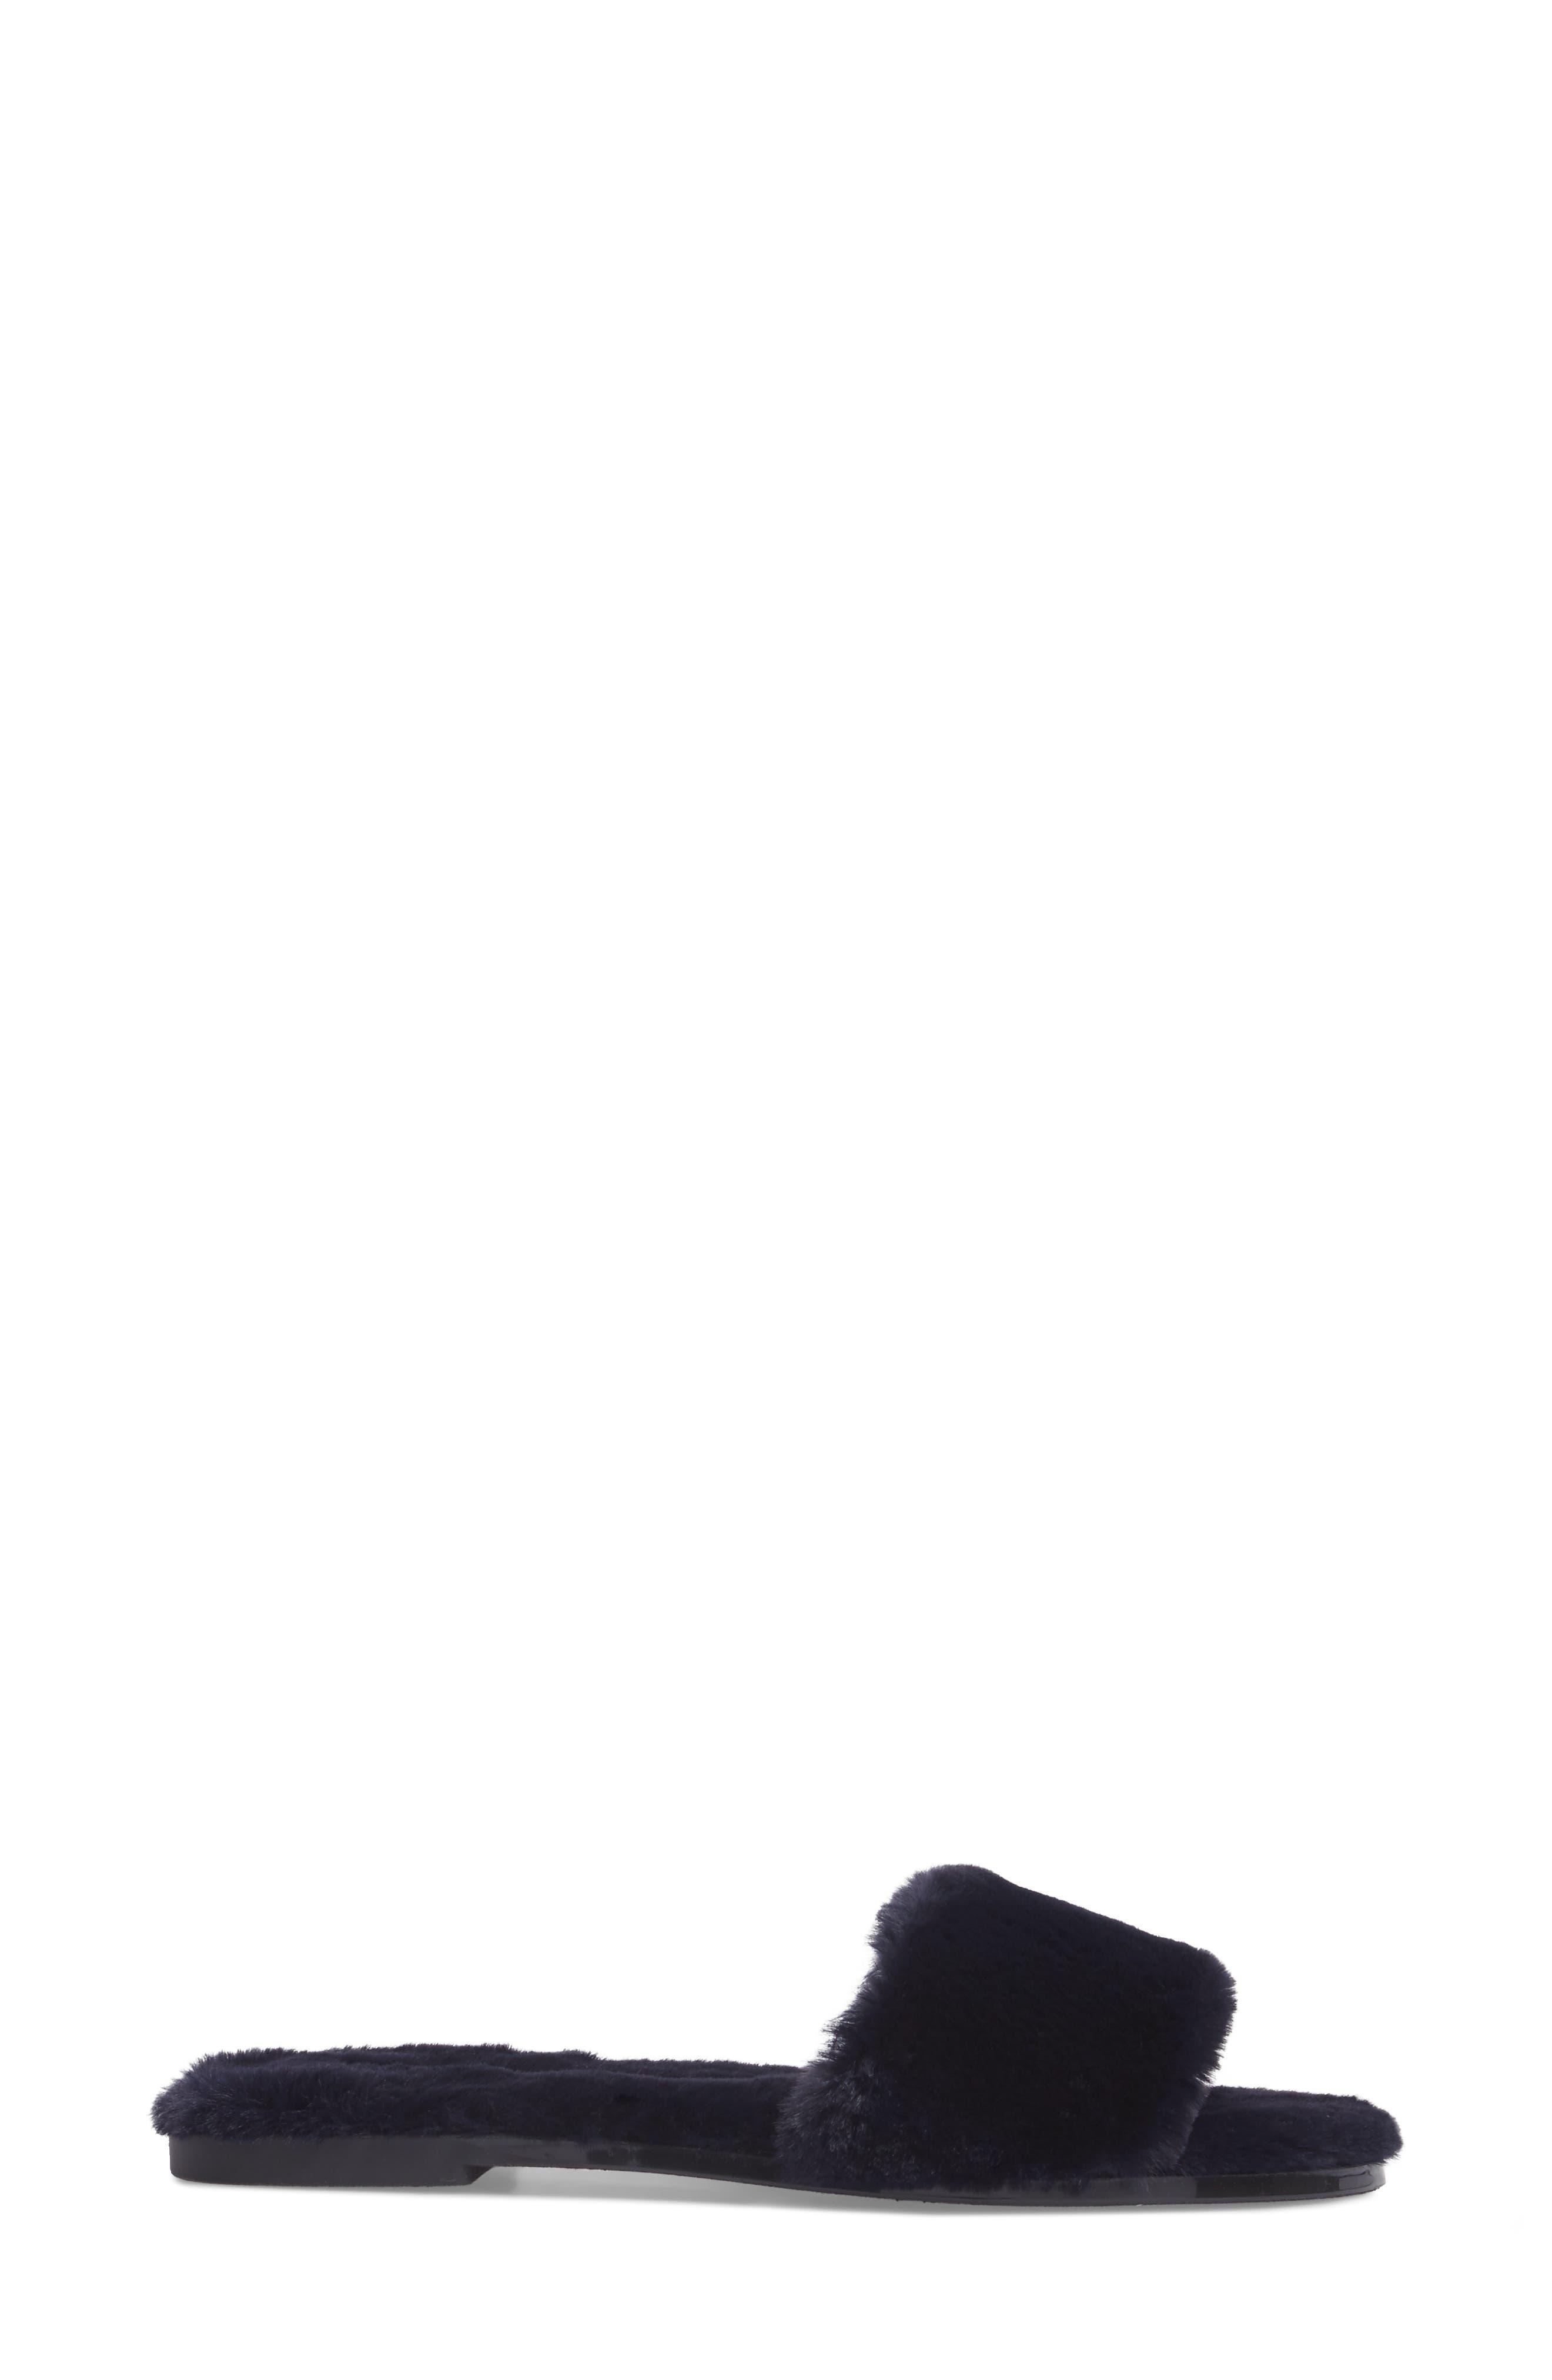 Mulholland Faux Fur Slide Sandal,                             Alternate thumbnail 3, color,                             Navy